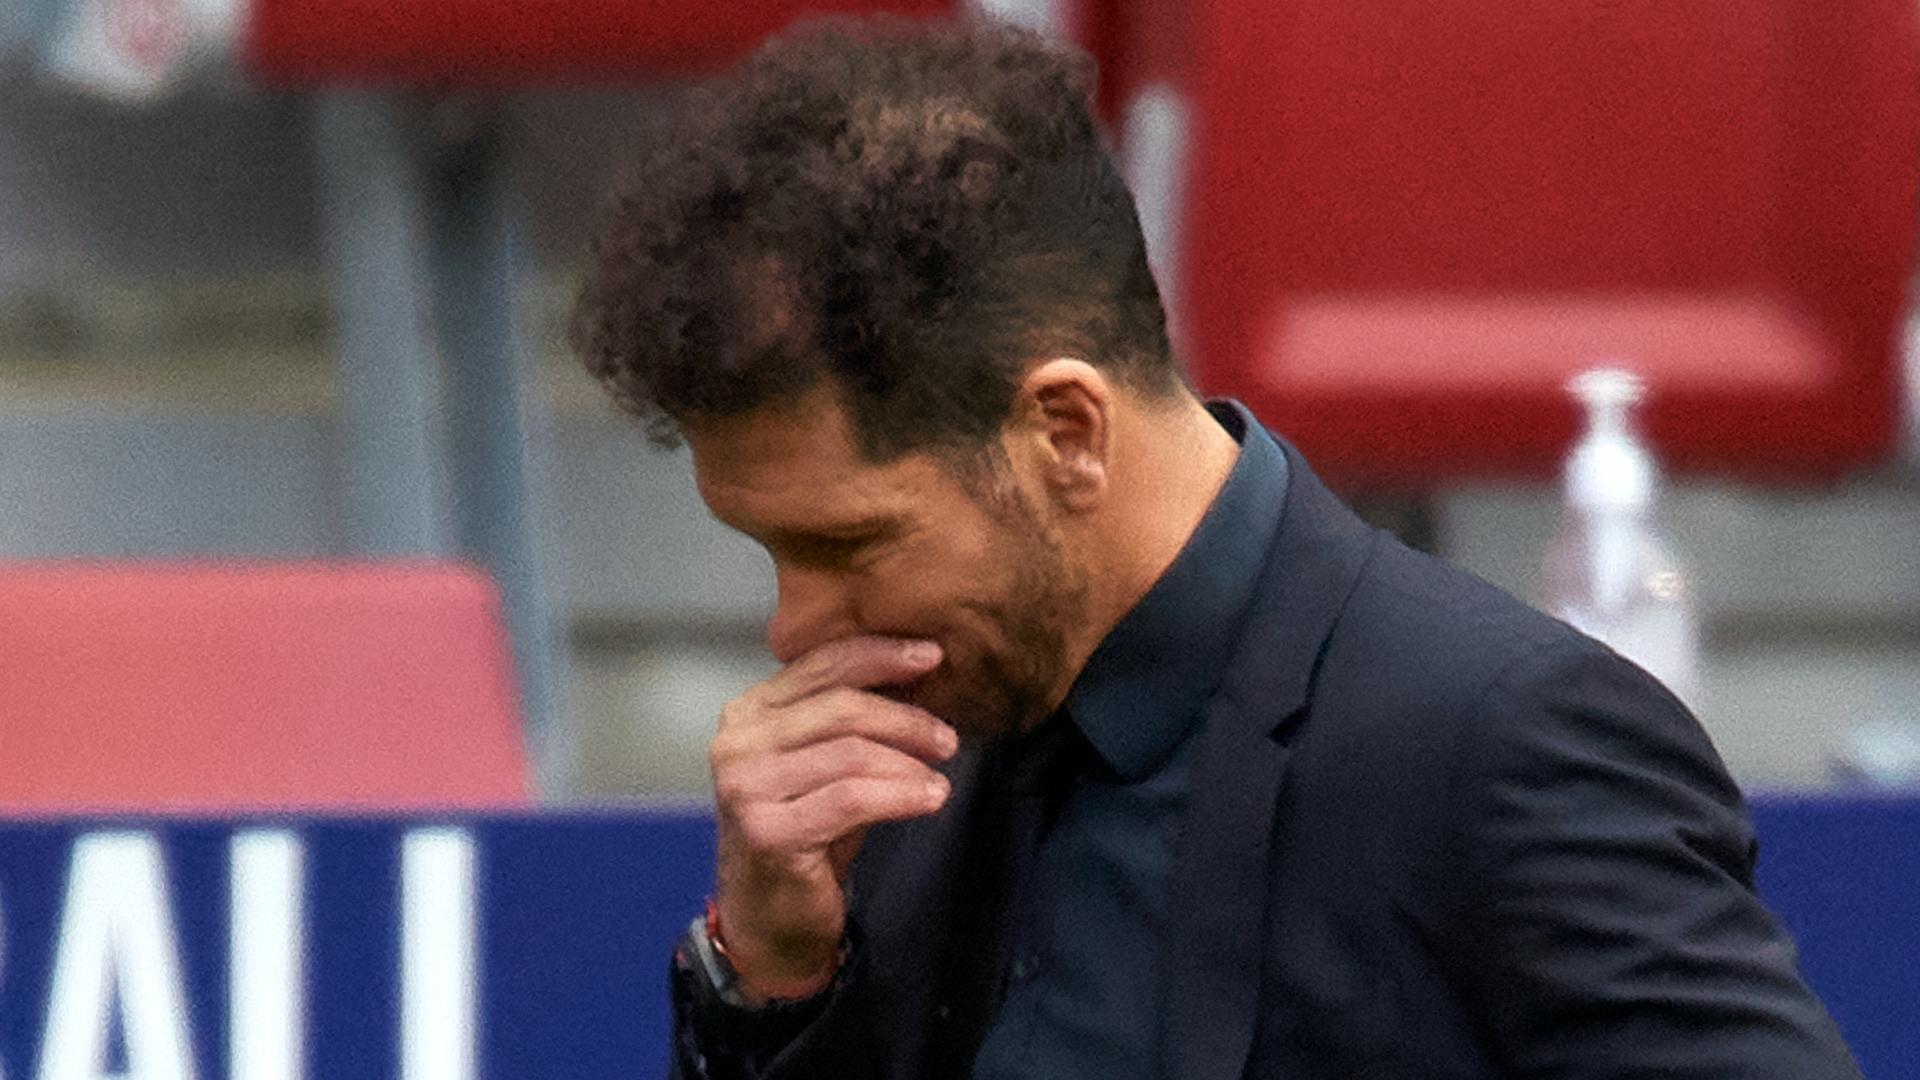 Athletic Bilbao 2-1 Atletico Madrid: Martinez stuns leaders with late winner